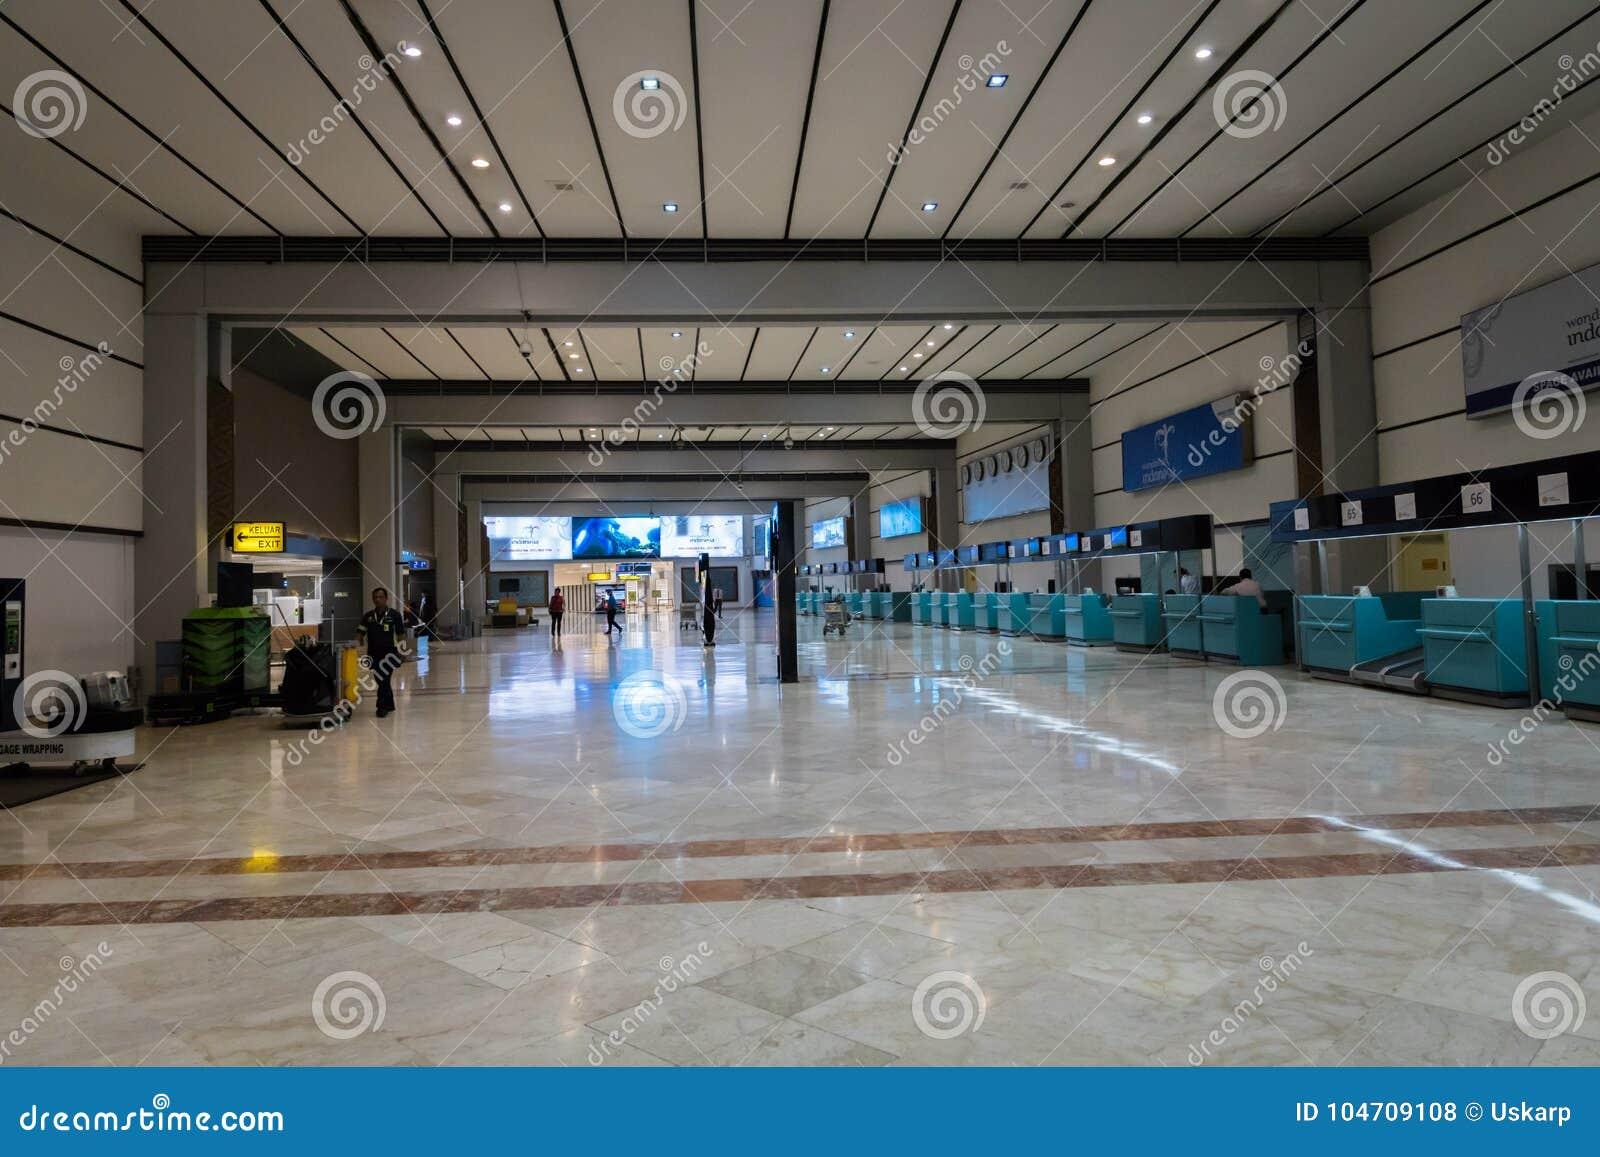 Jakarta Soekarno-Hatta International Airport Terminal 2